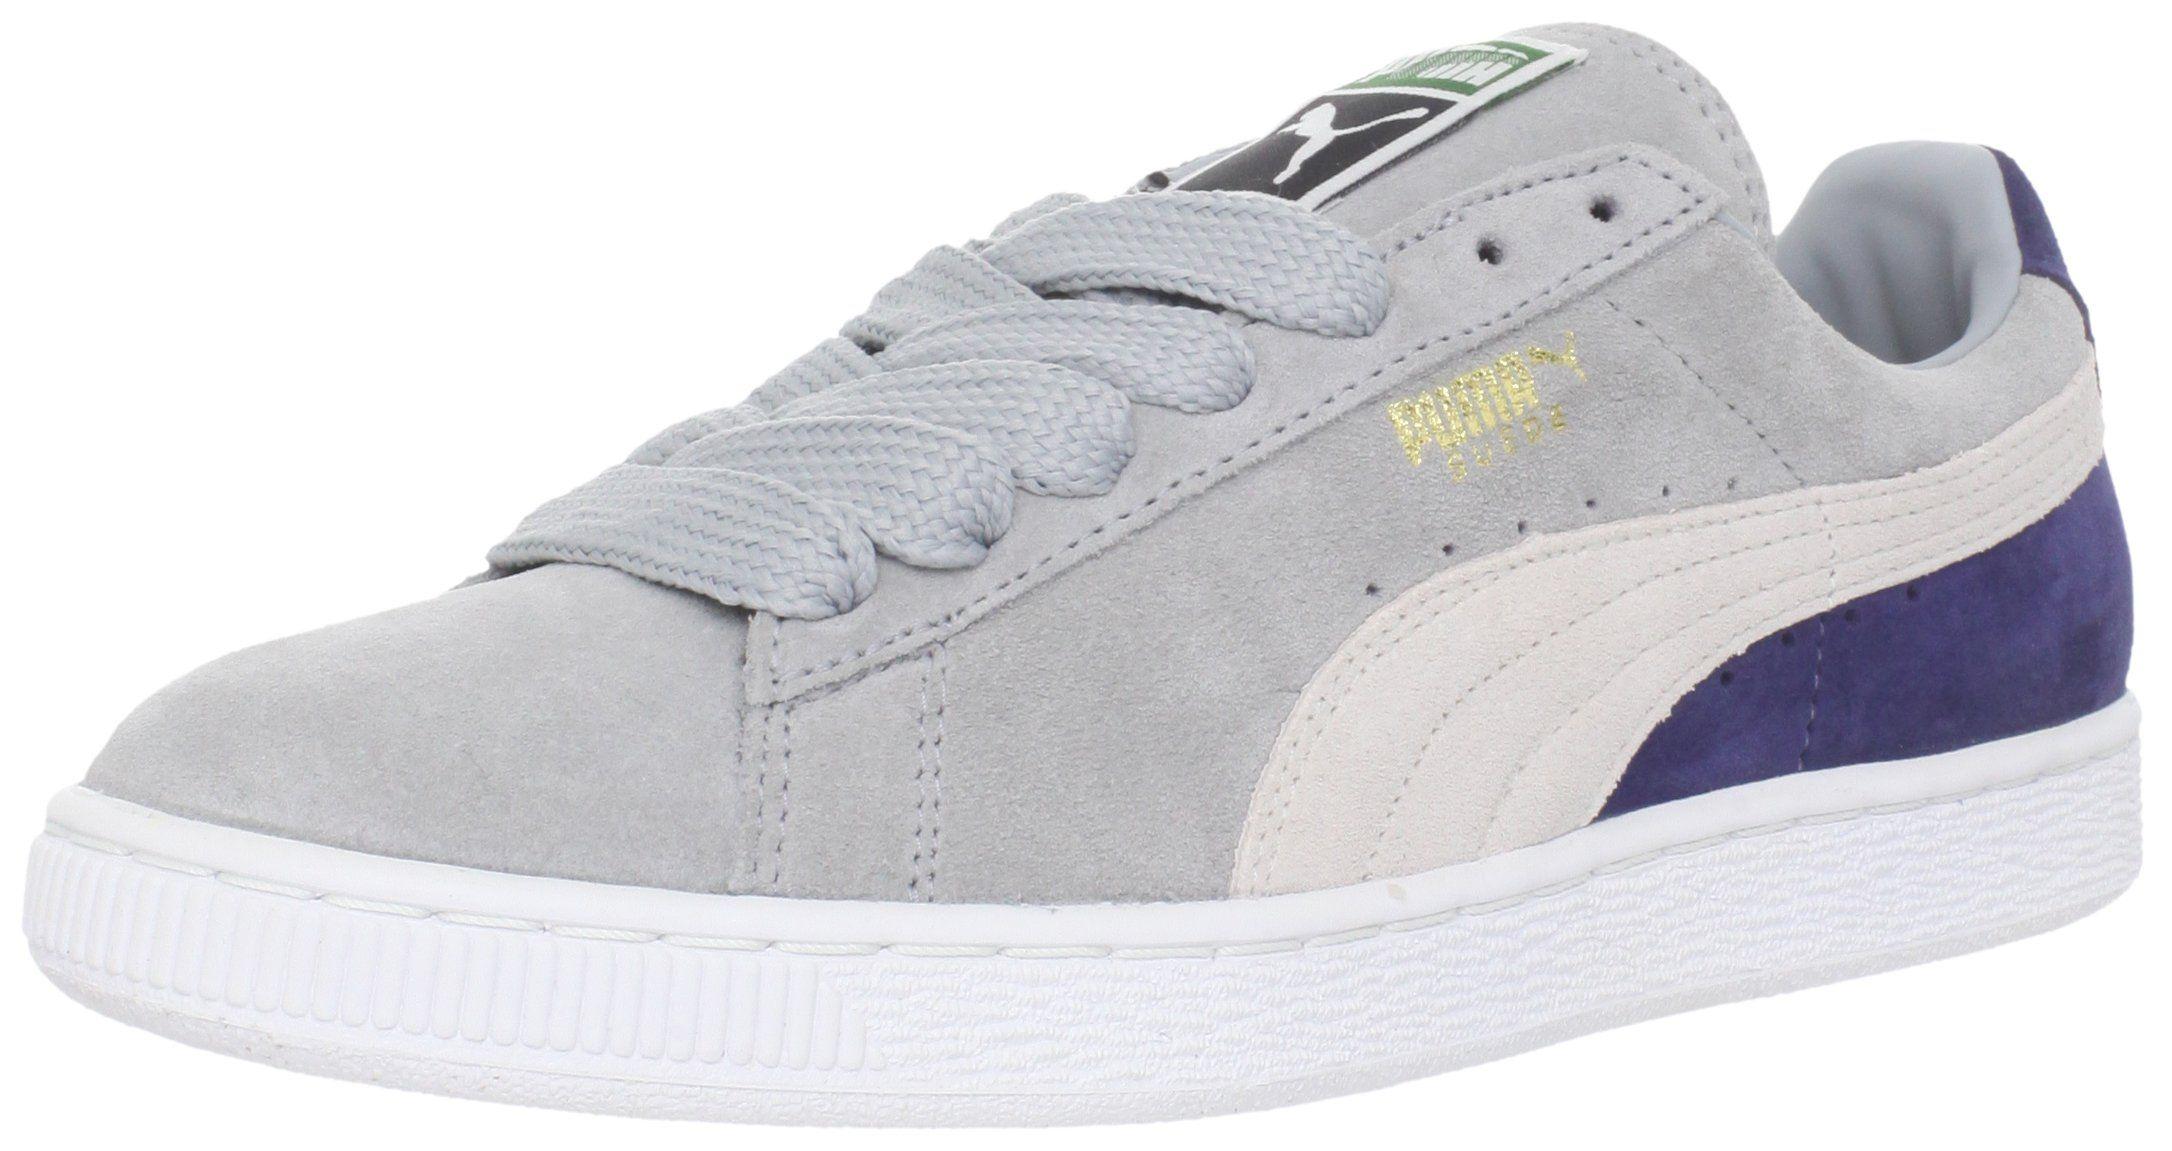 PUMA Suede Classic Sneaker,Quarry/White/Medieval Blue,12 M US Women's/10.5 M US…